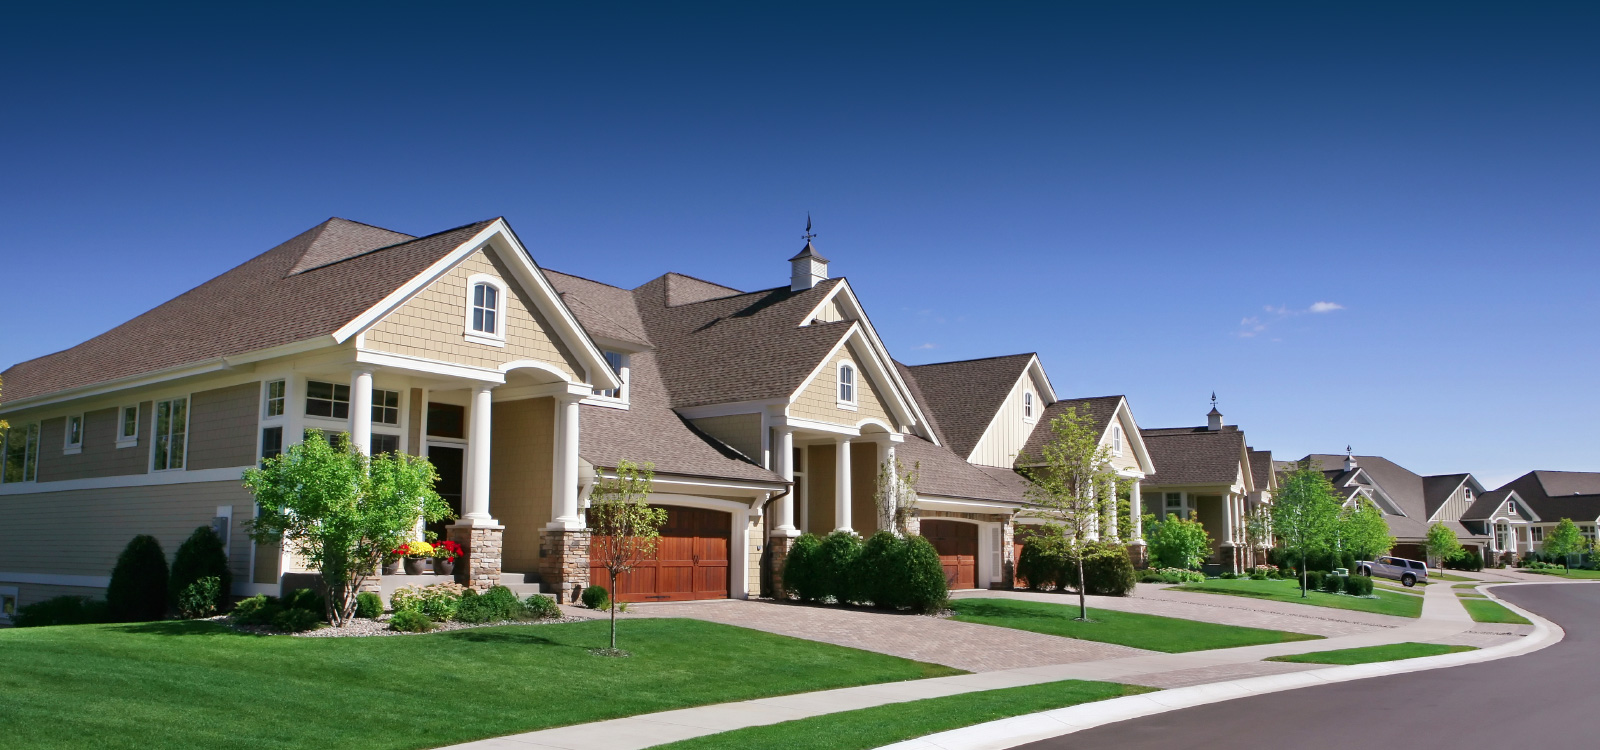 Home Inspection Checklist Covington